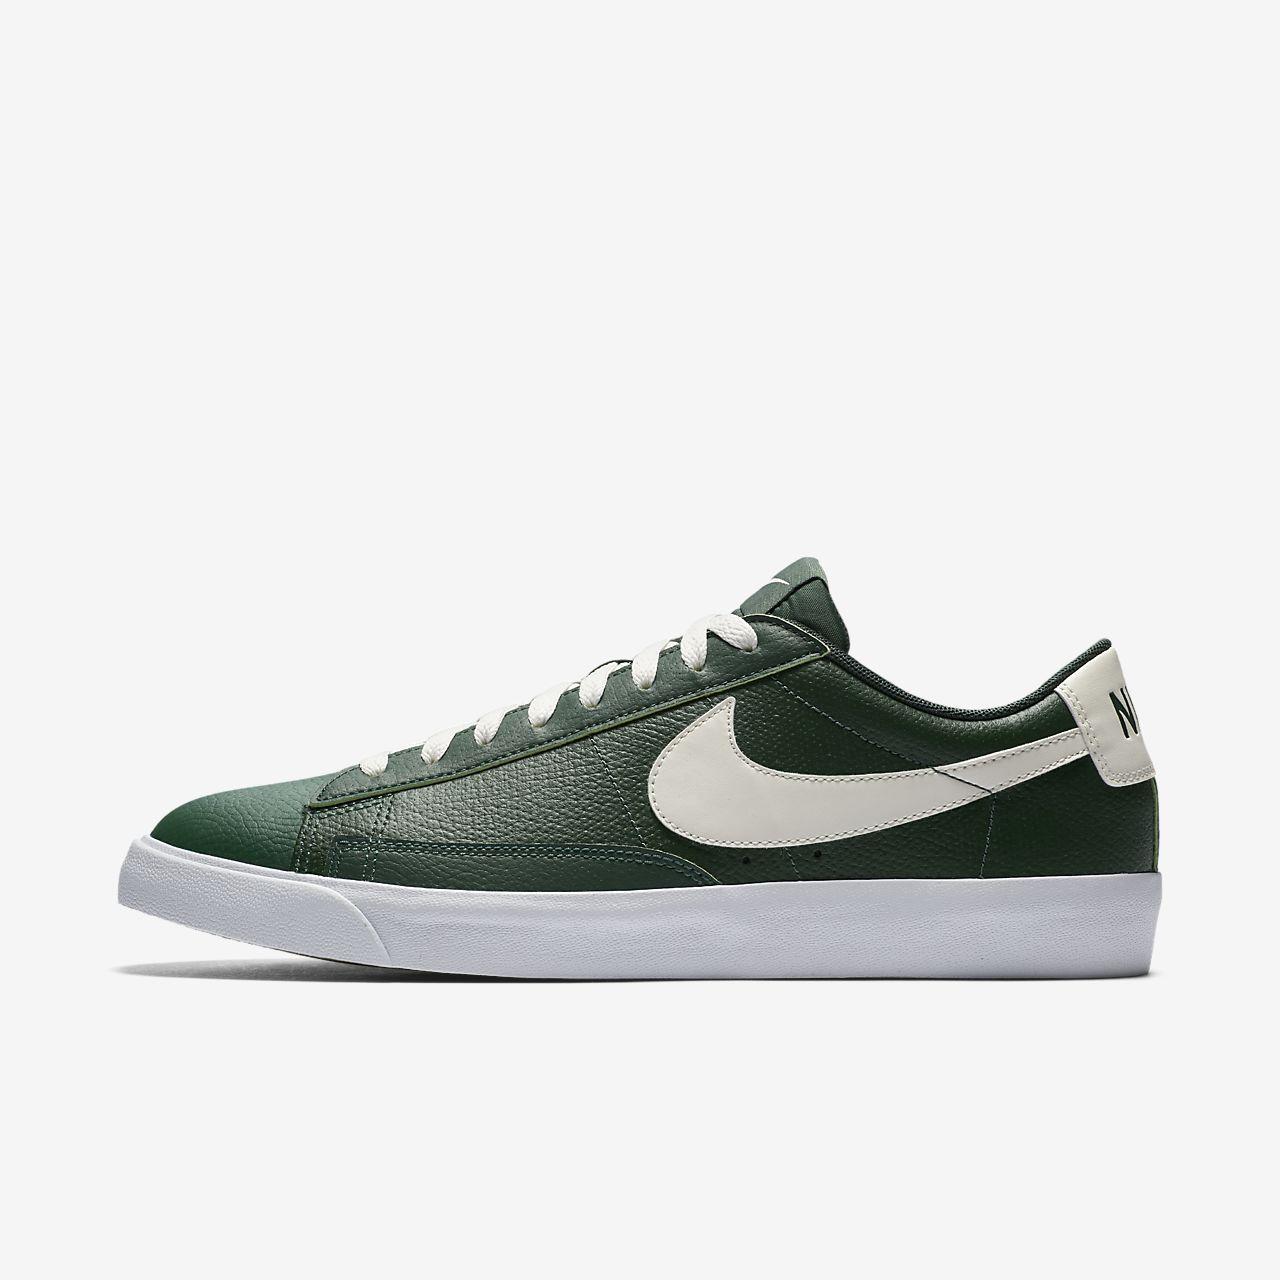 d6d6aa97c05 Men s Nike Blazer Low Leather Casual Shoes Fir Sail Gum Medium Brown AJ9515  300